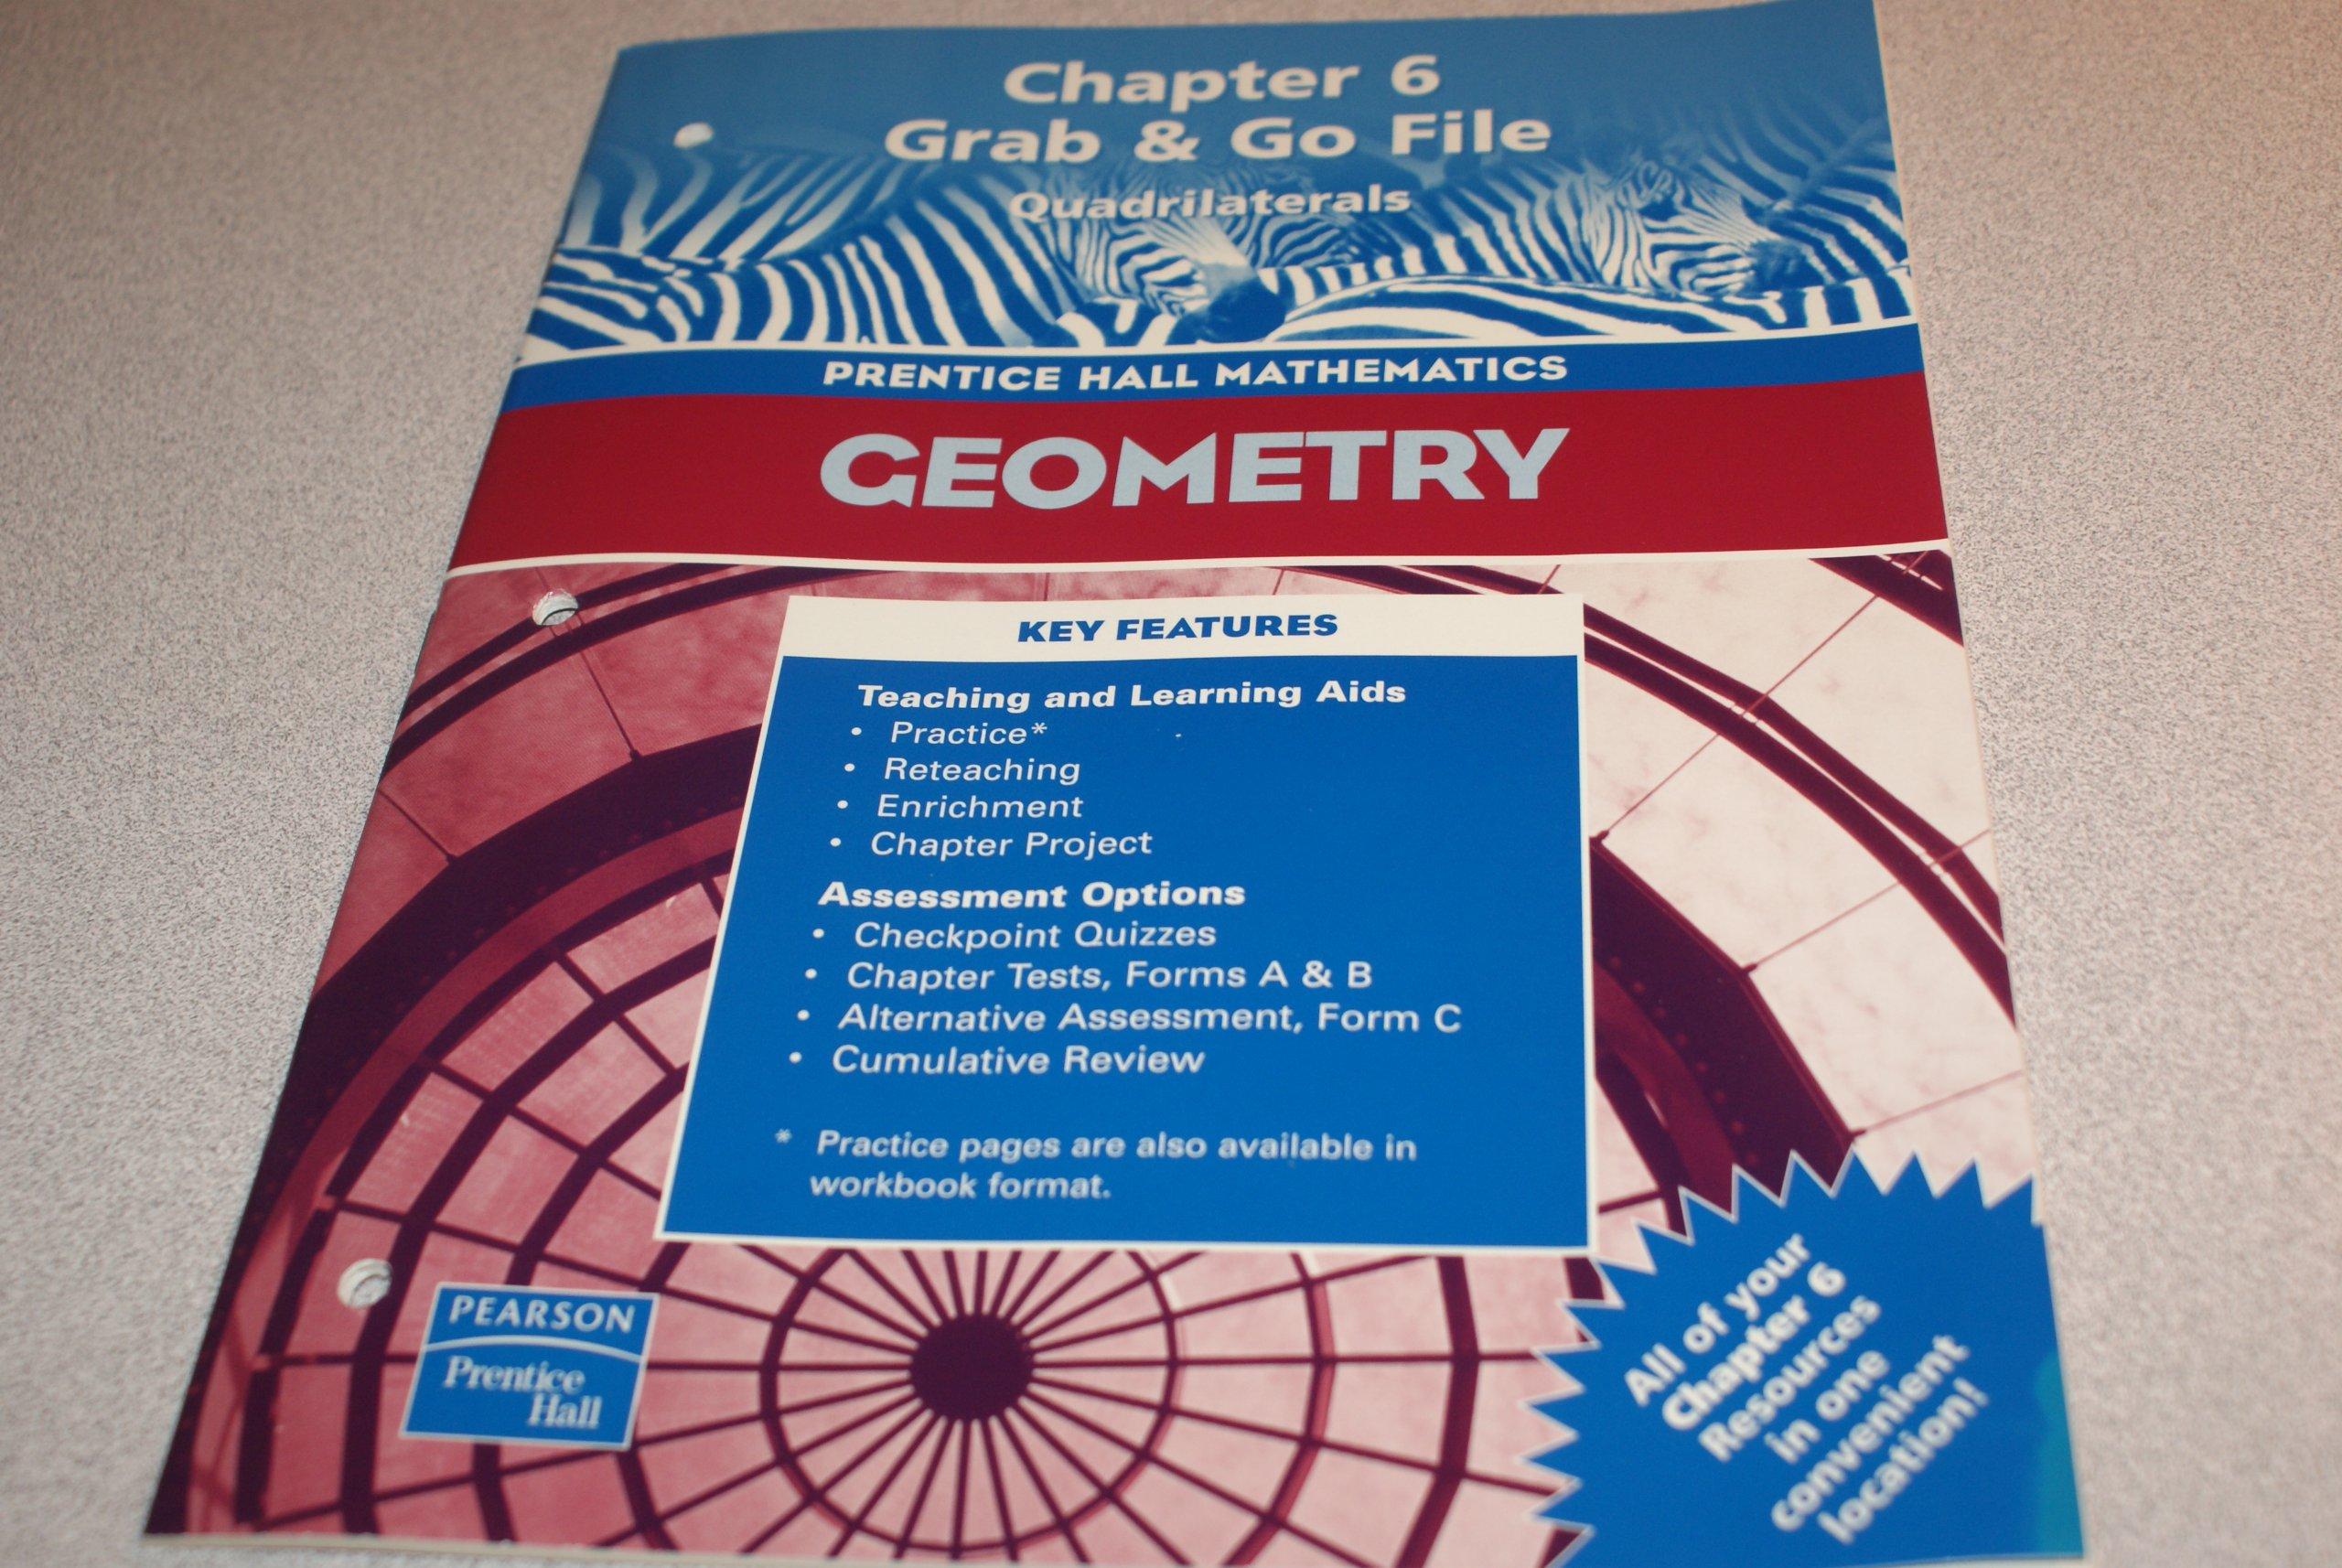 Read Online Geometry, Chapter 6 Grab & Go File: Quadrilaterals (Prentice Hall Mathematics) PDF